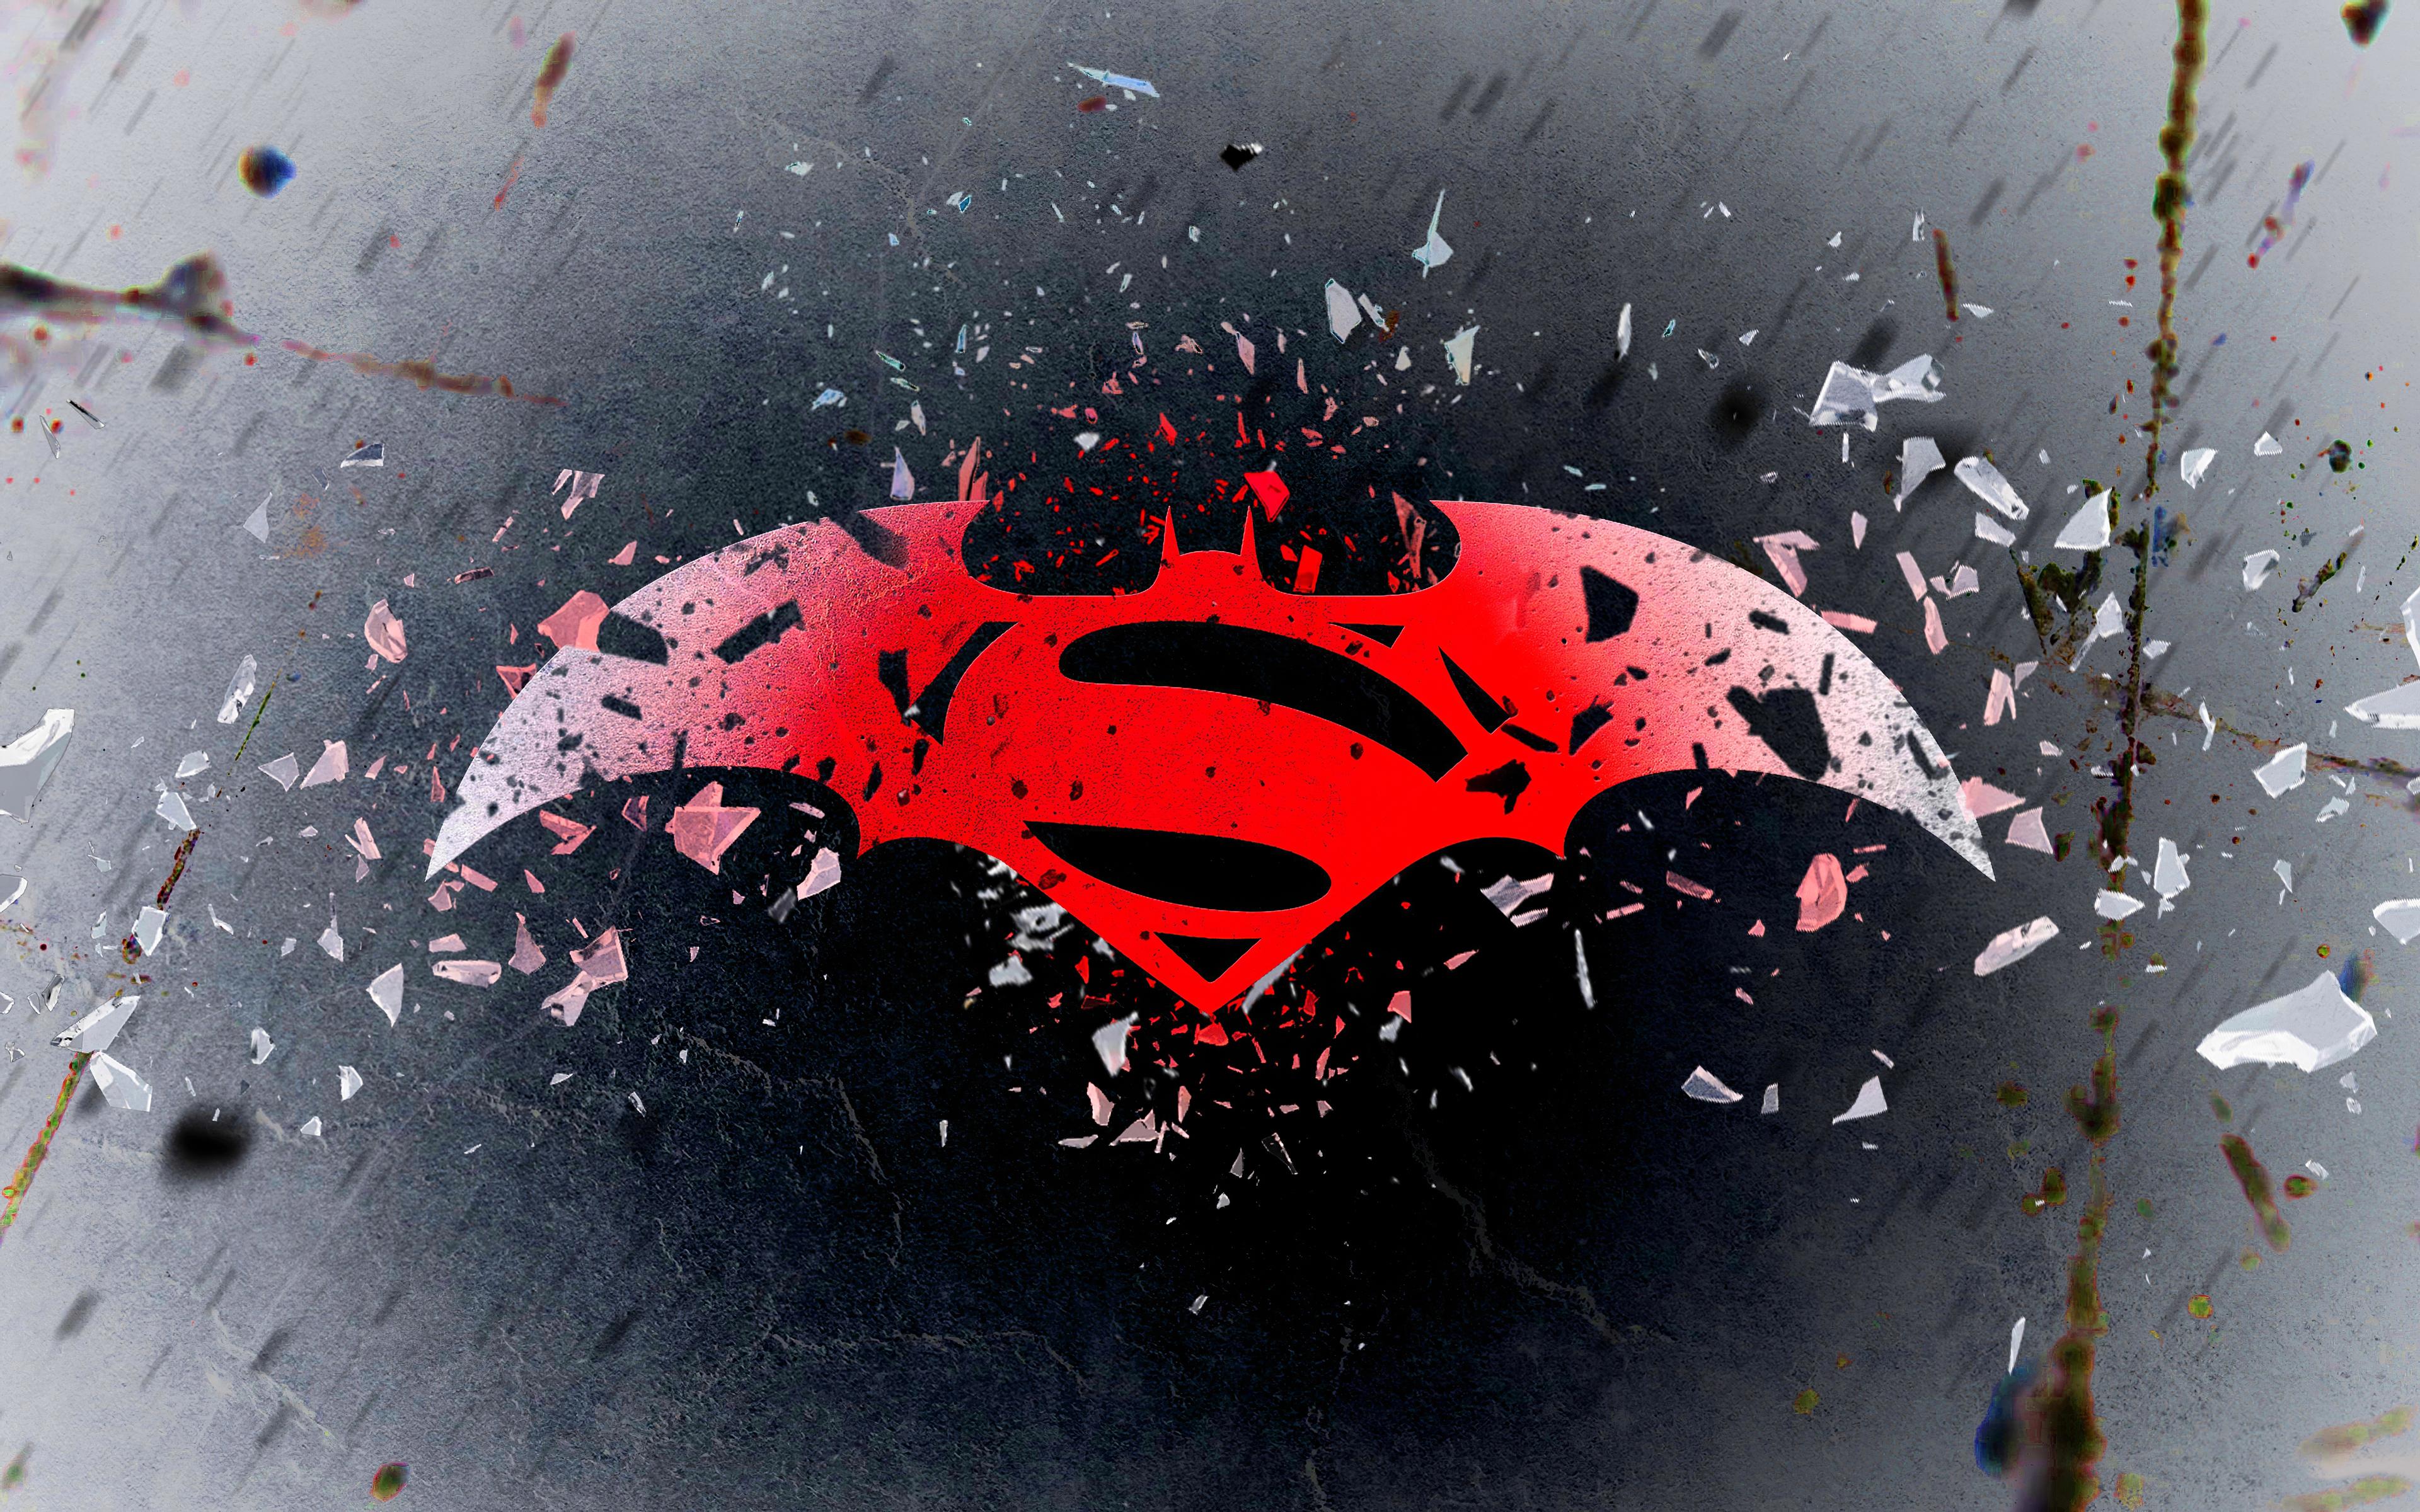 batman superman logo artwork 1576092647 - Batman Superman Logo Artwork - superman logo hd 4k, batman logo 4k wallpaper, batman and superman wallpaper hd 4k, Batman and superman logo wallpaper hd 4k